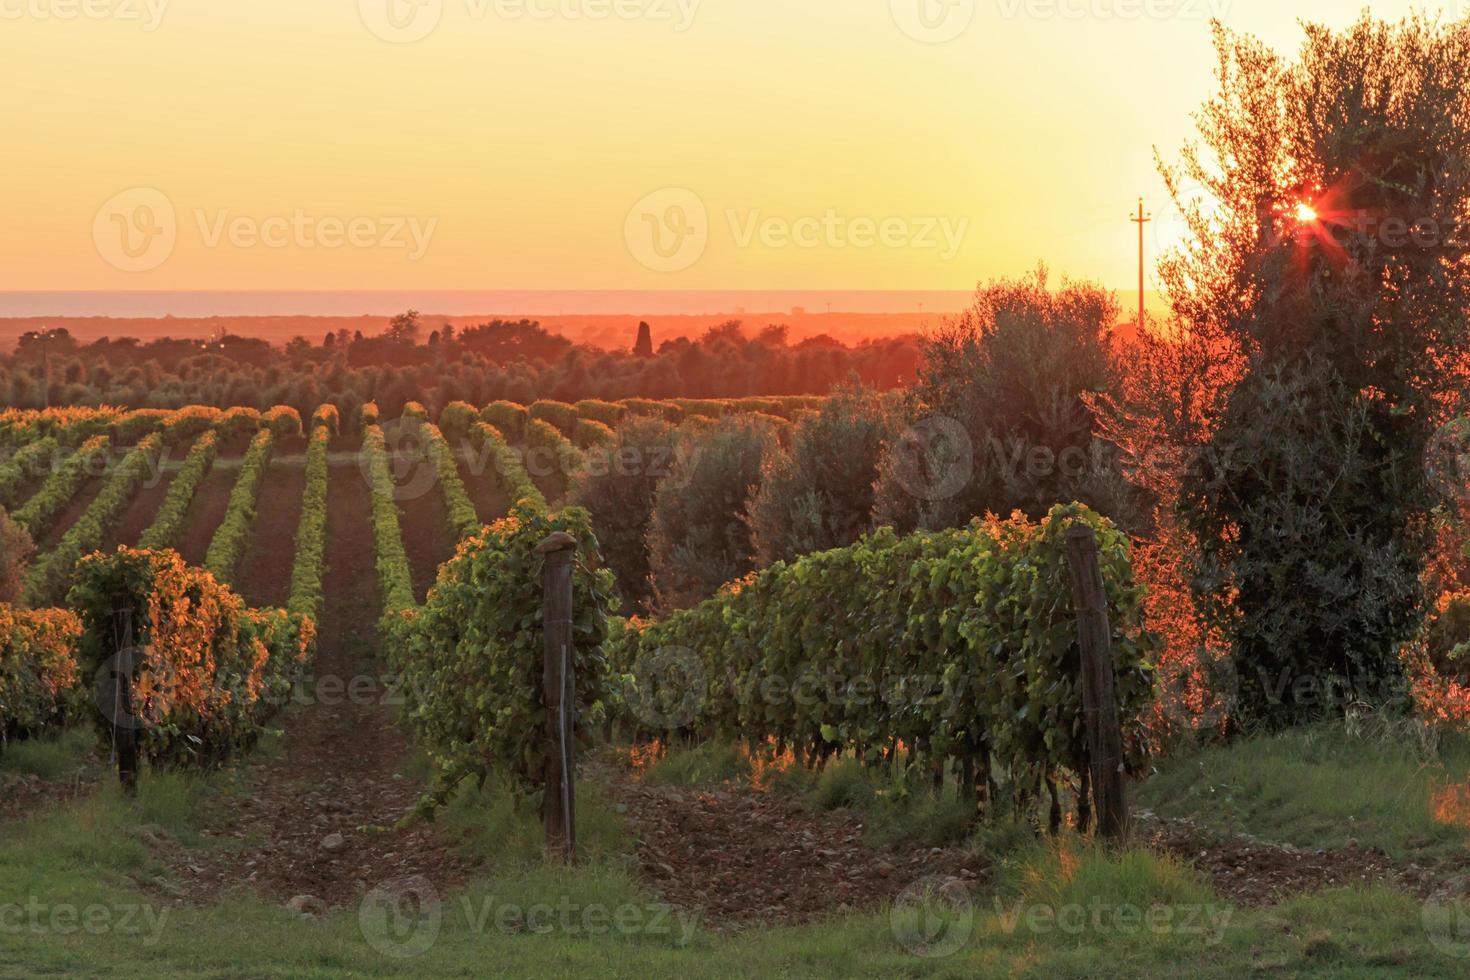 Sonnenuntergang in einem Weinberg, Toskana - Italien foto